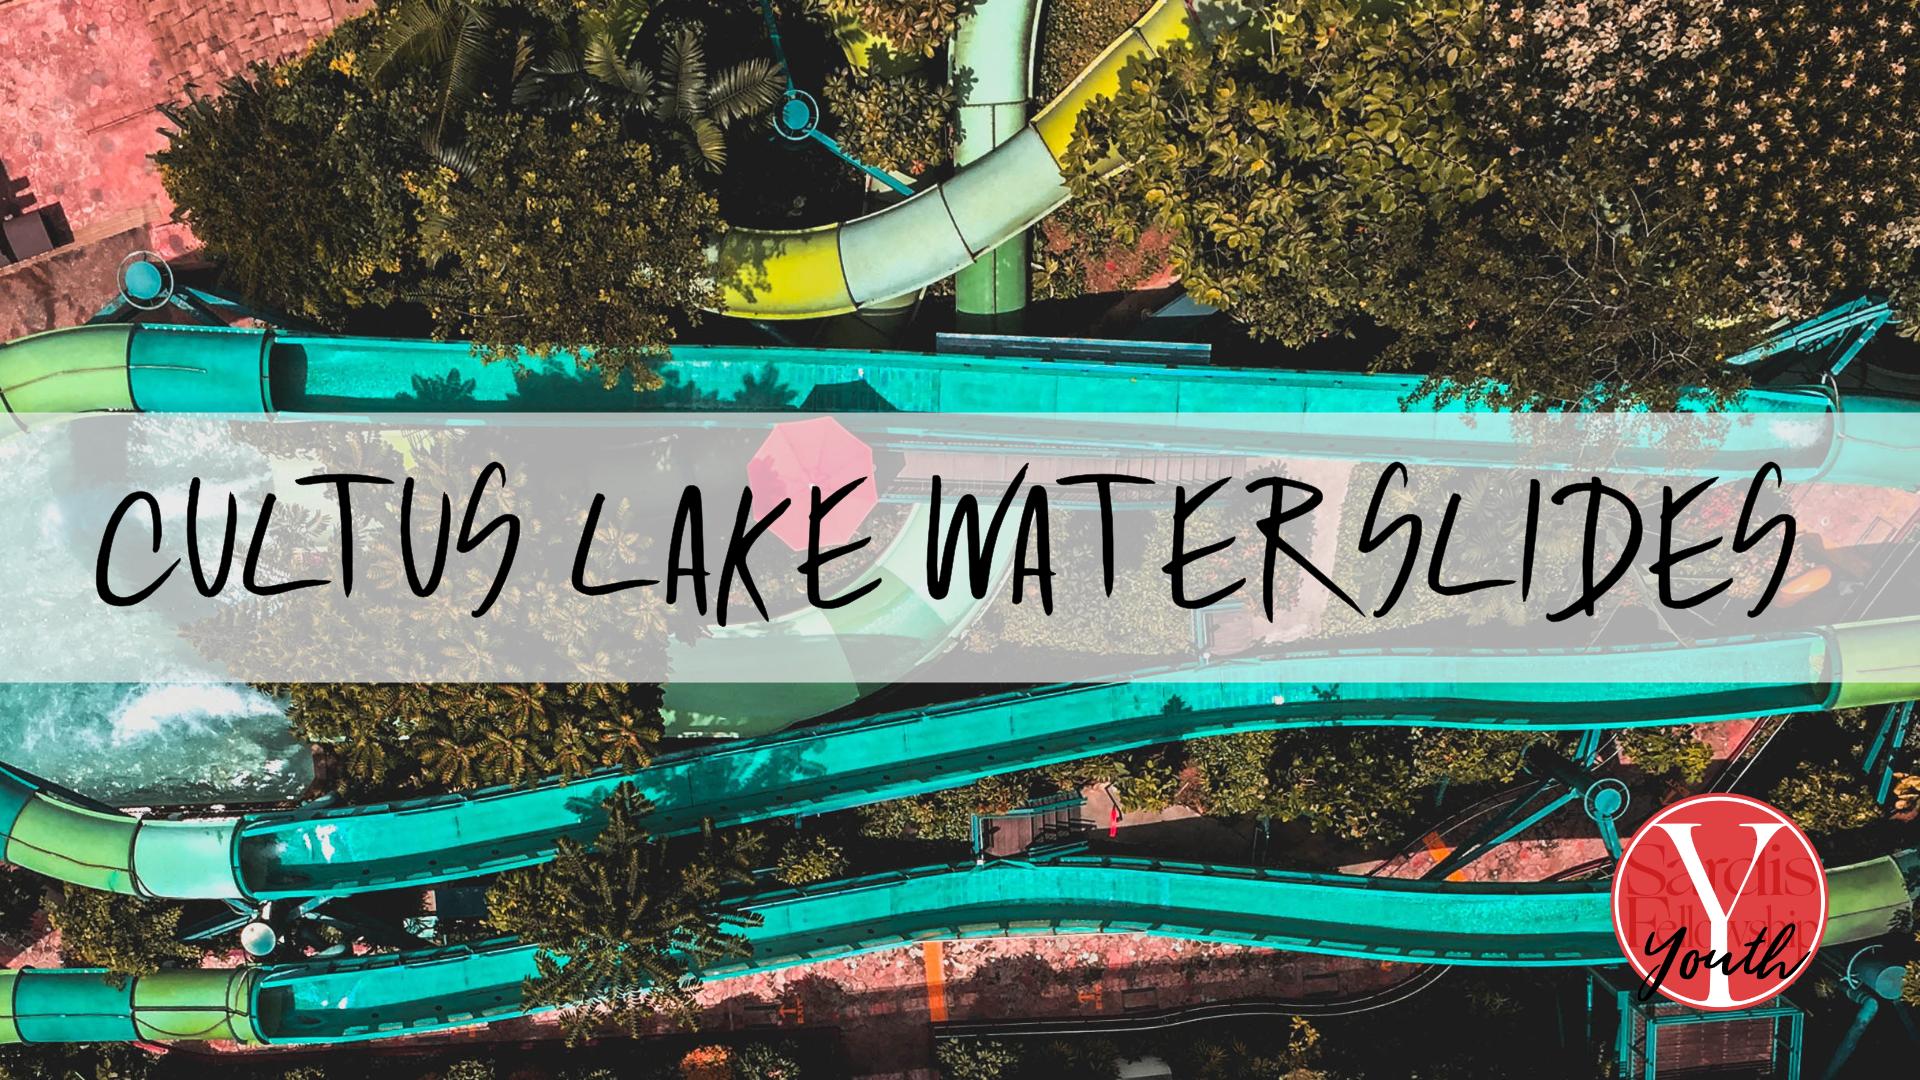 Cultus Lake Waterslides Web.png